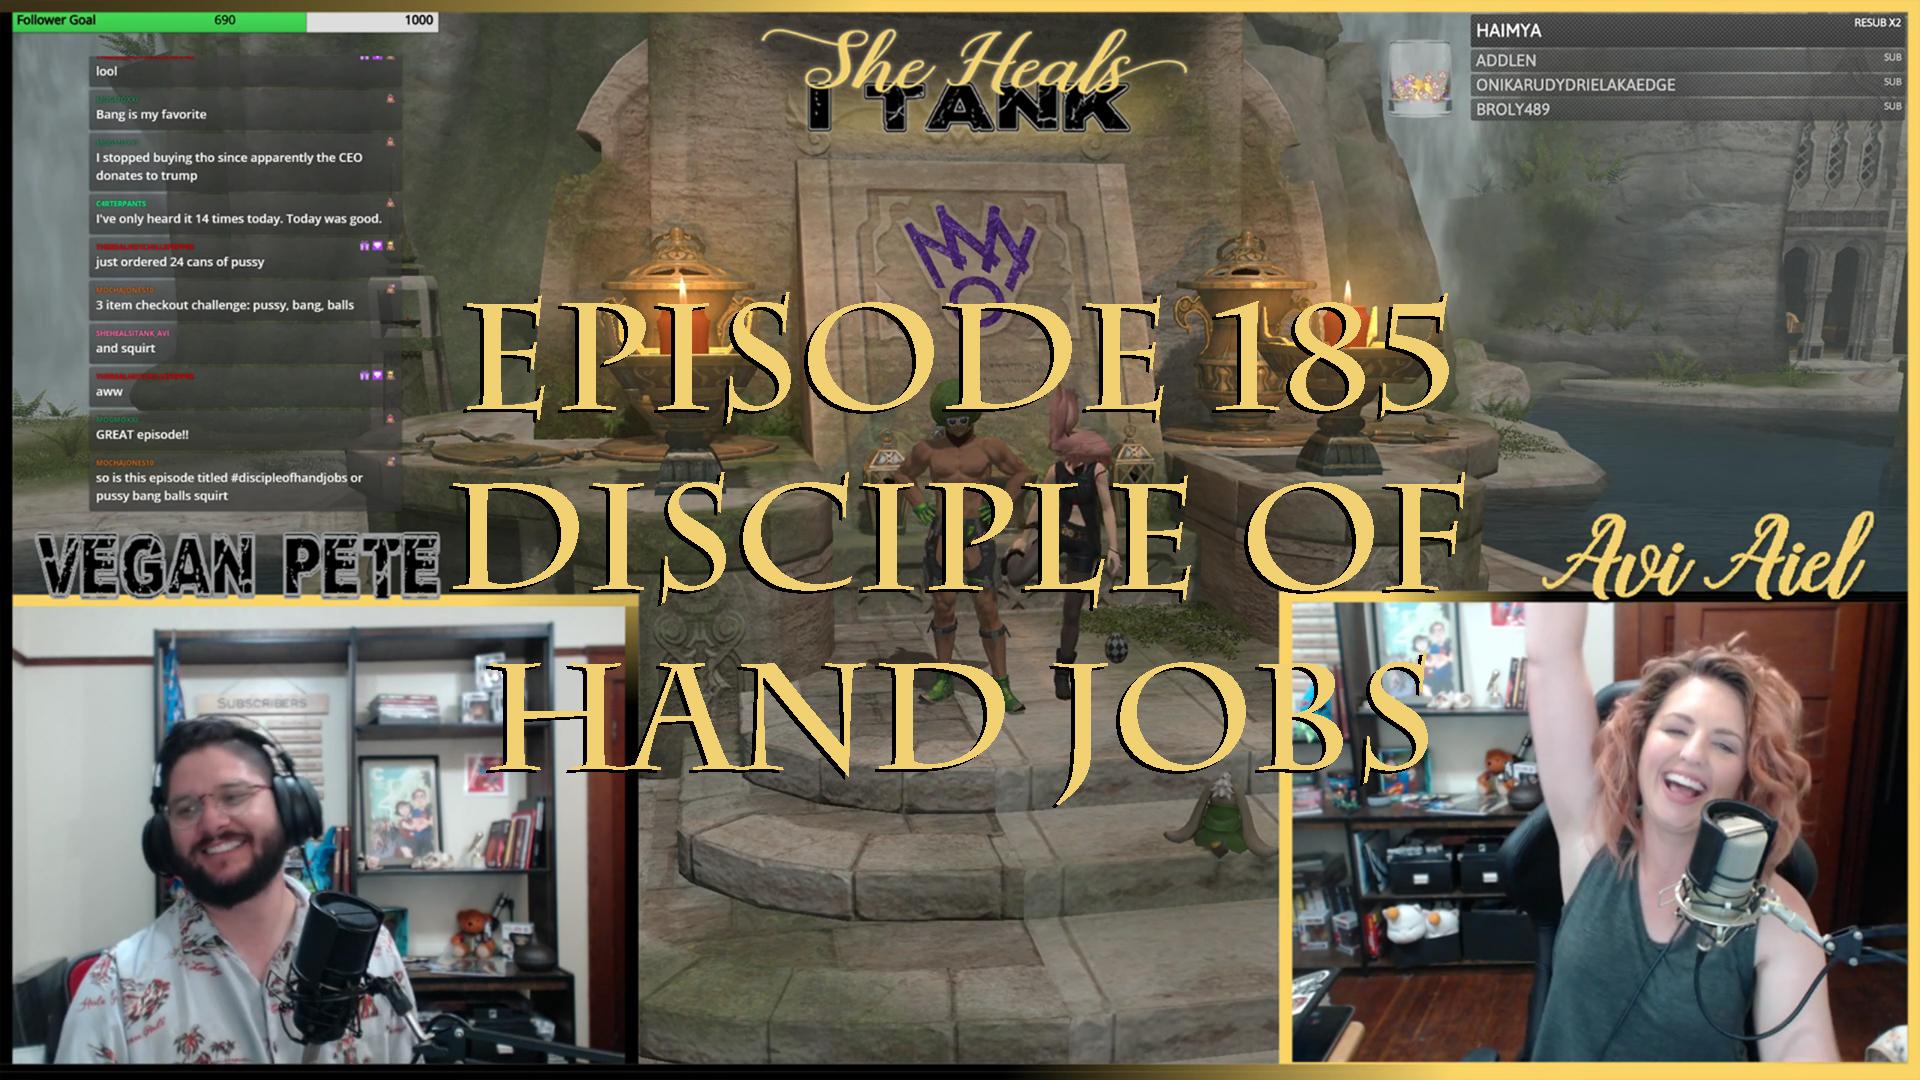 She Heals I Tank: The Weekly Final Fantasy XIV Podcast